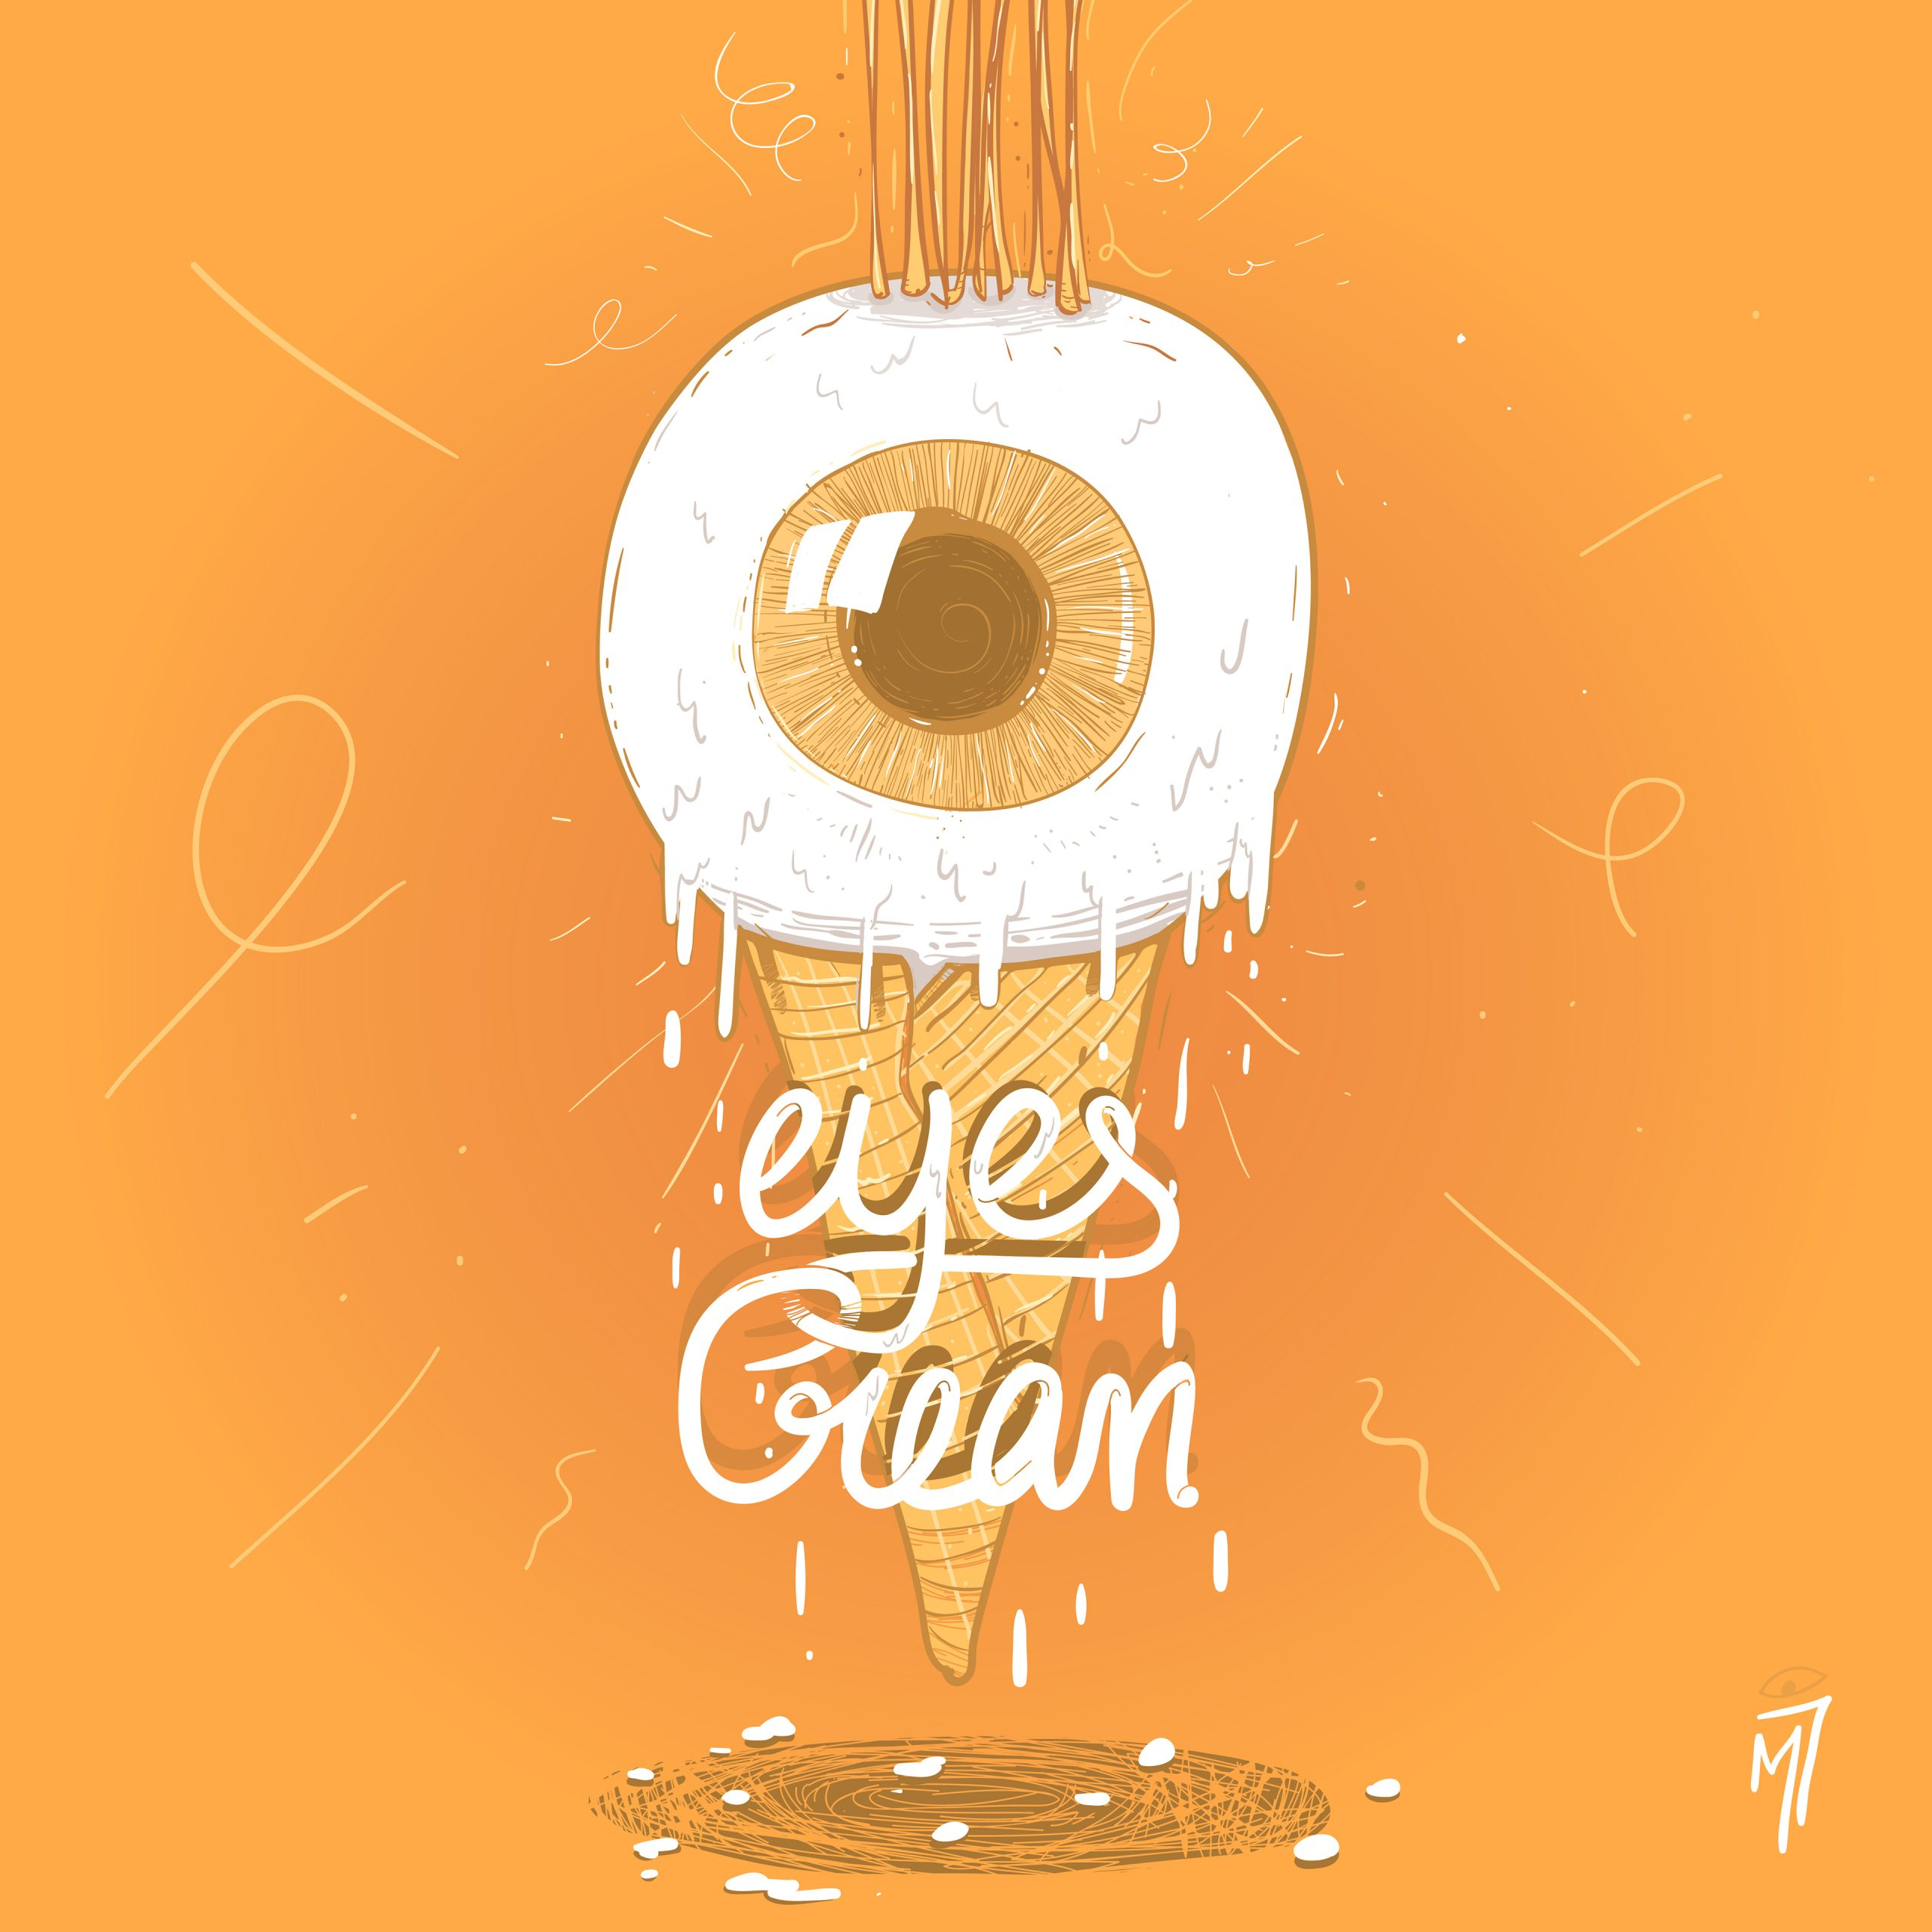 minastrie eyes cream illustration